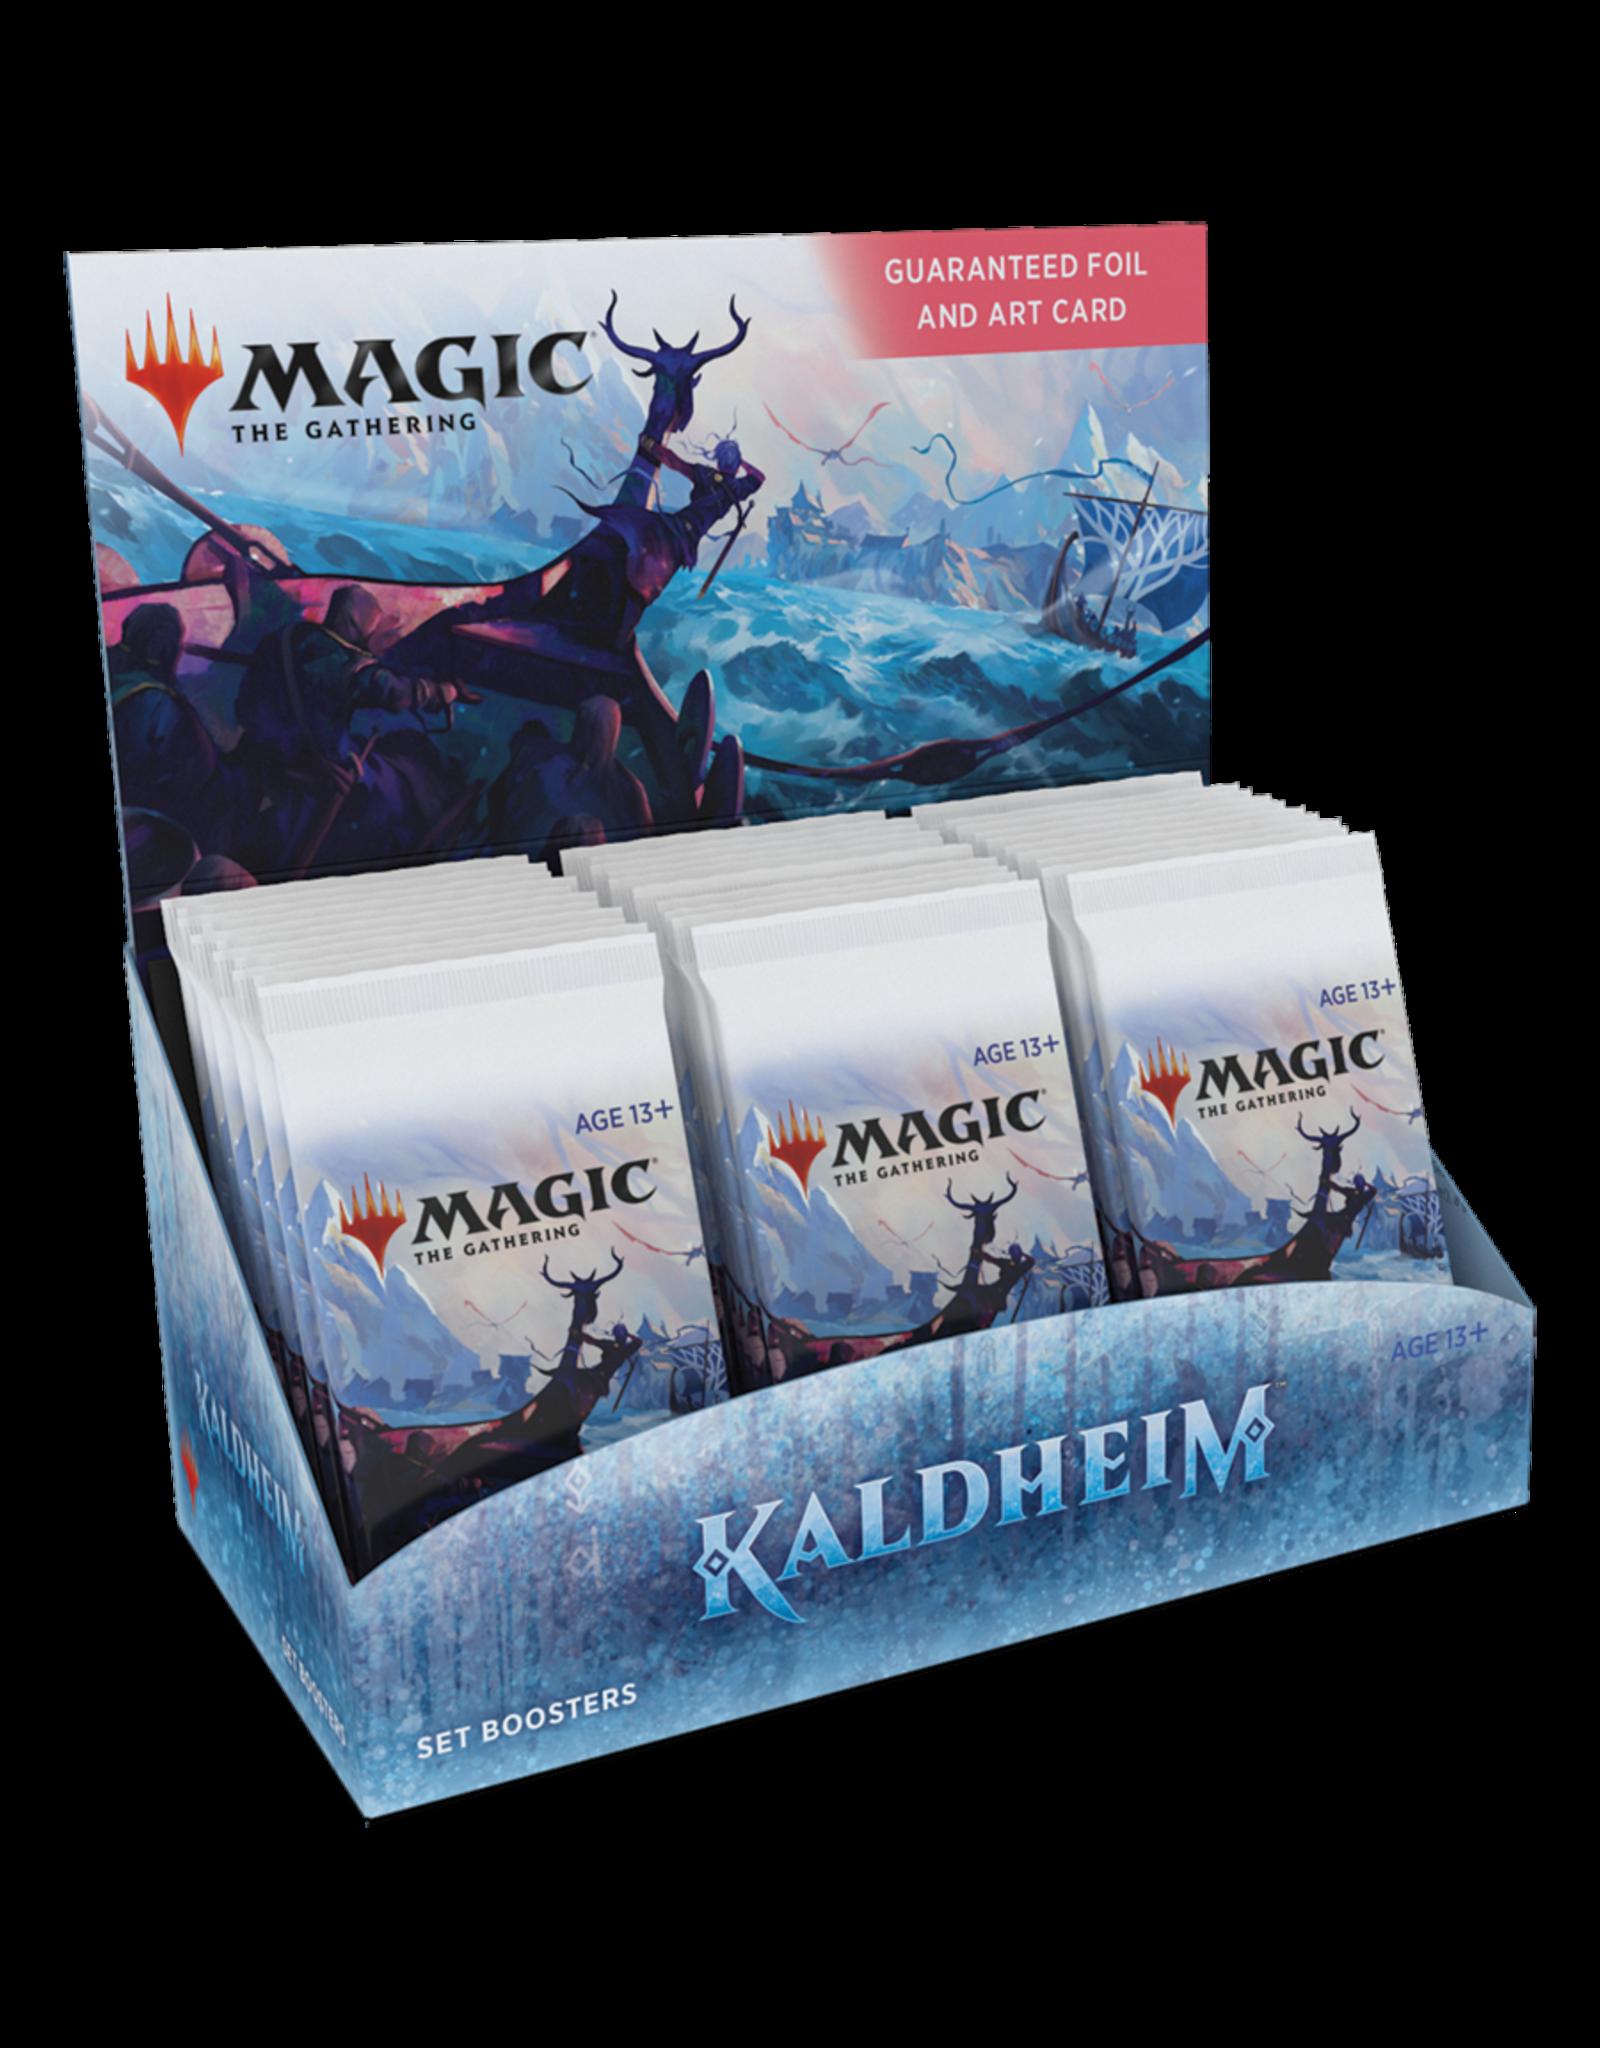 Wizards of the Coast MTG KALDHEIM SET BOOSTER BOX *DATE DE SORTIE 5 FÉVRIER*